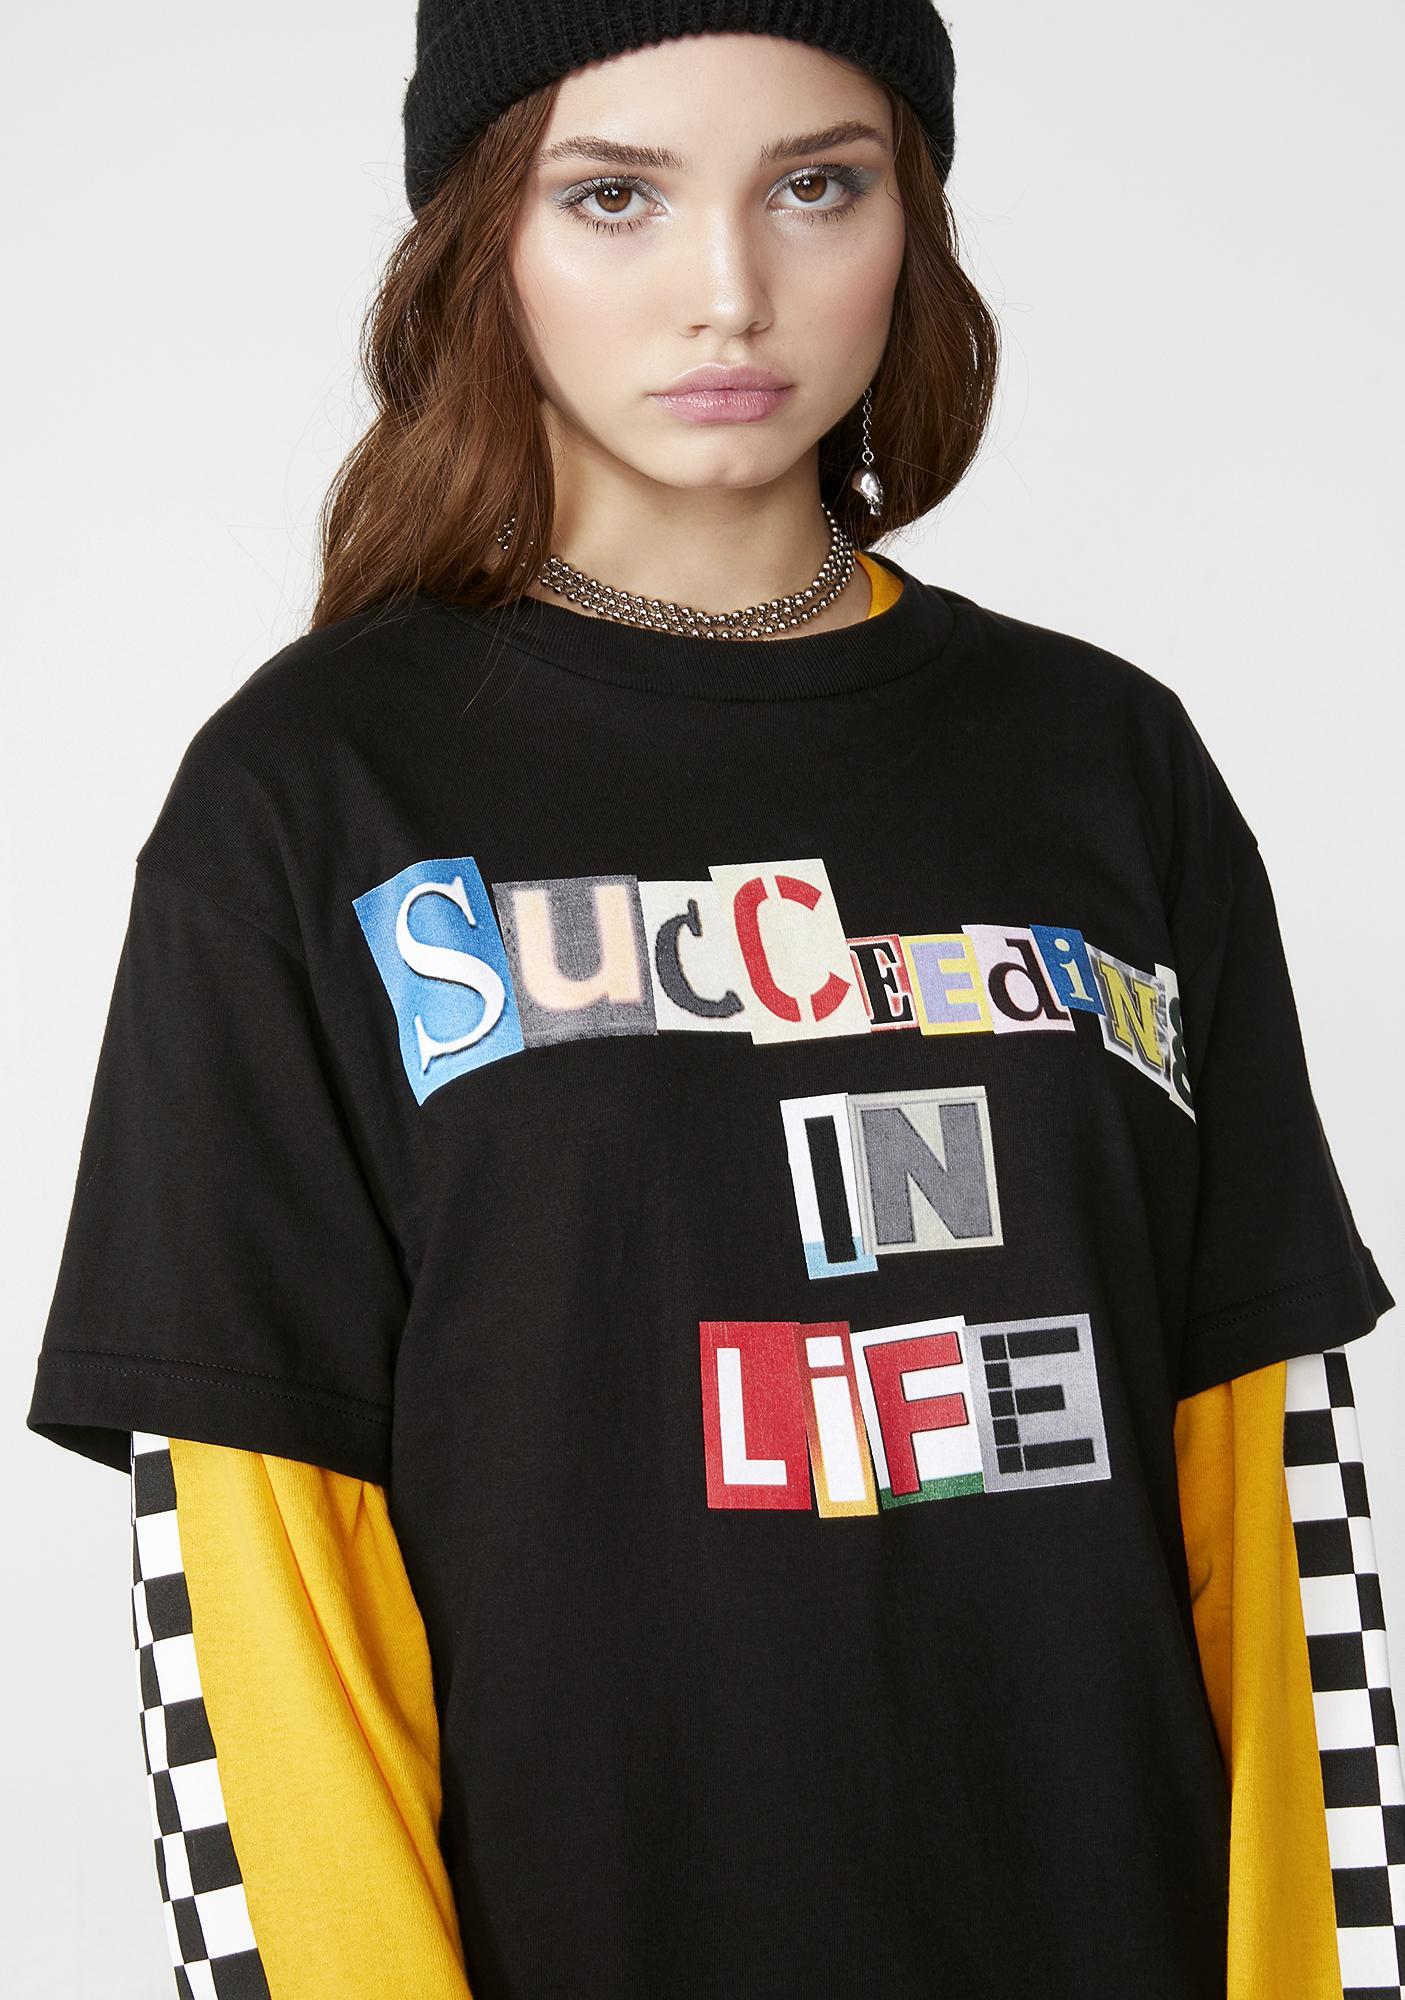 SUCC INTERNATIONAL Succeeding In Life Tee